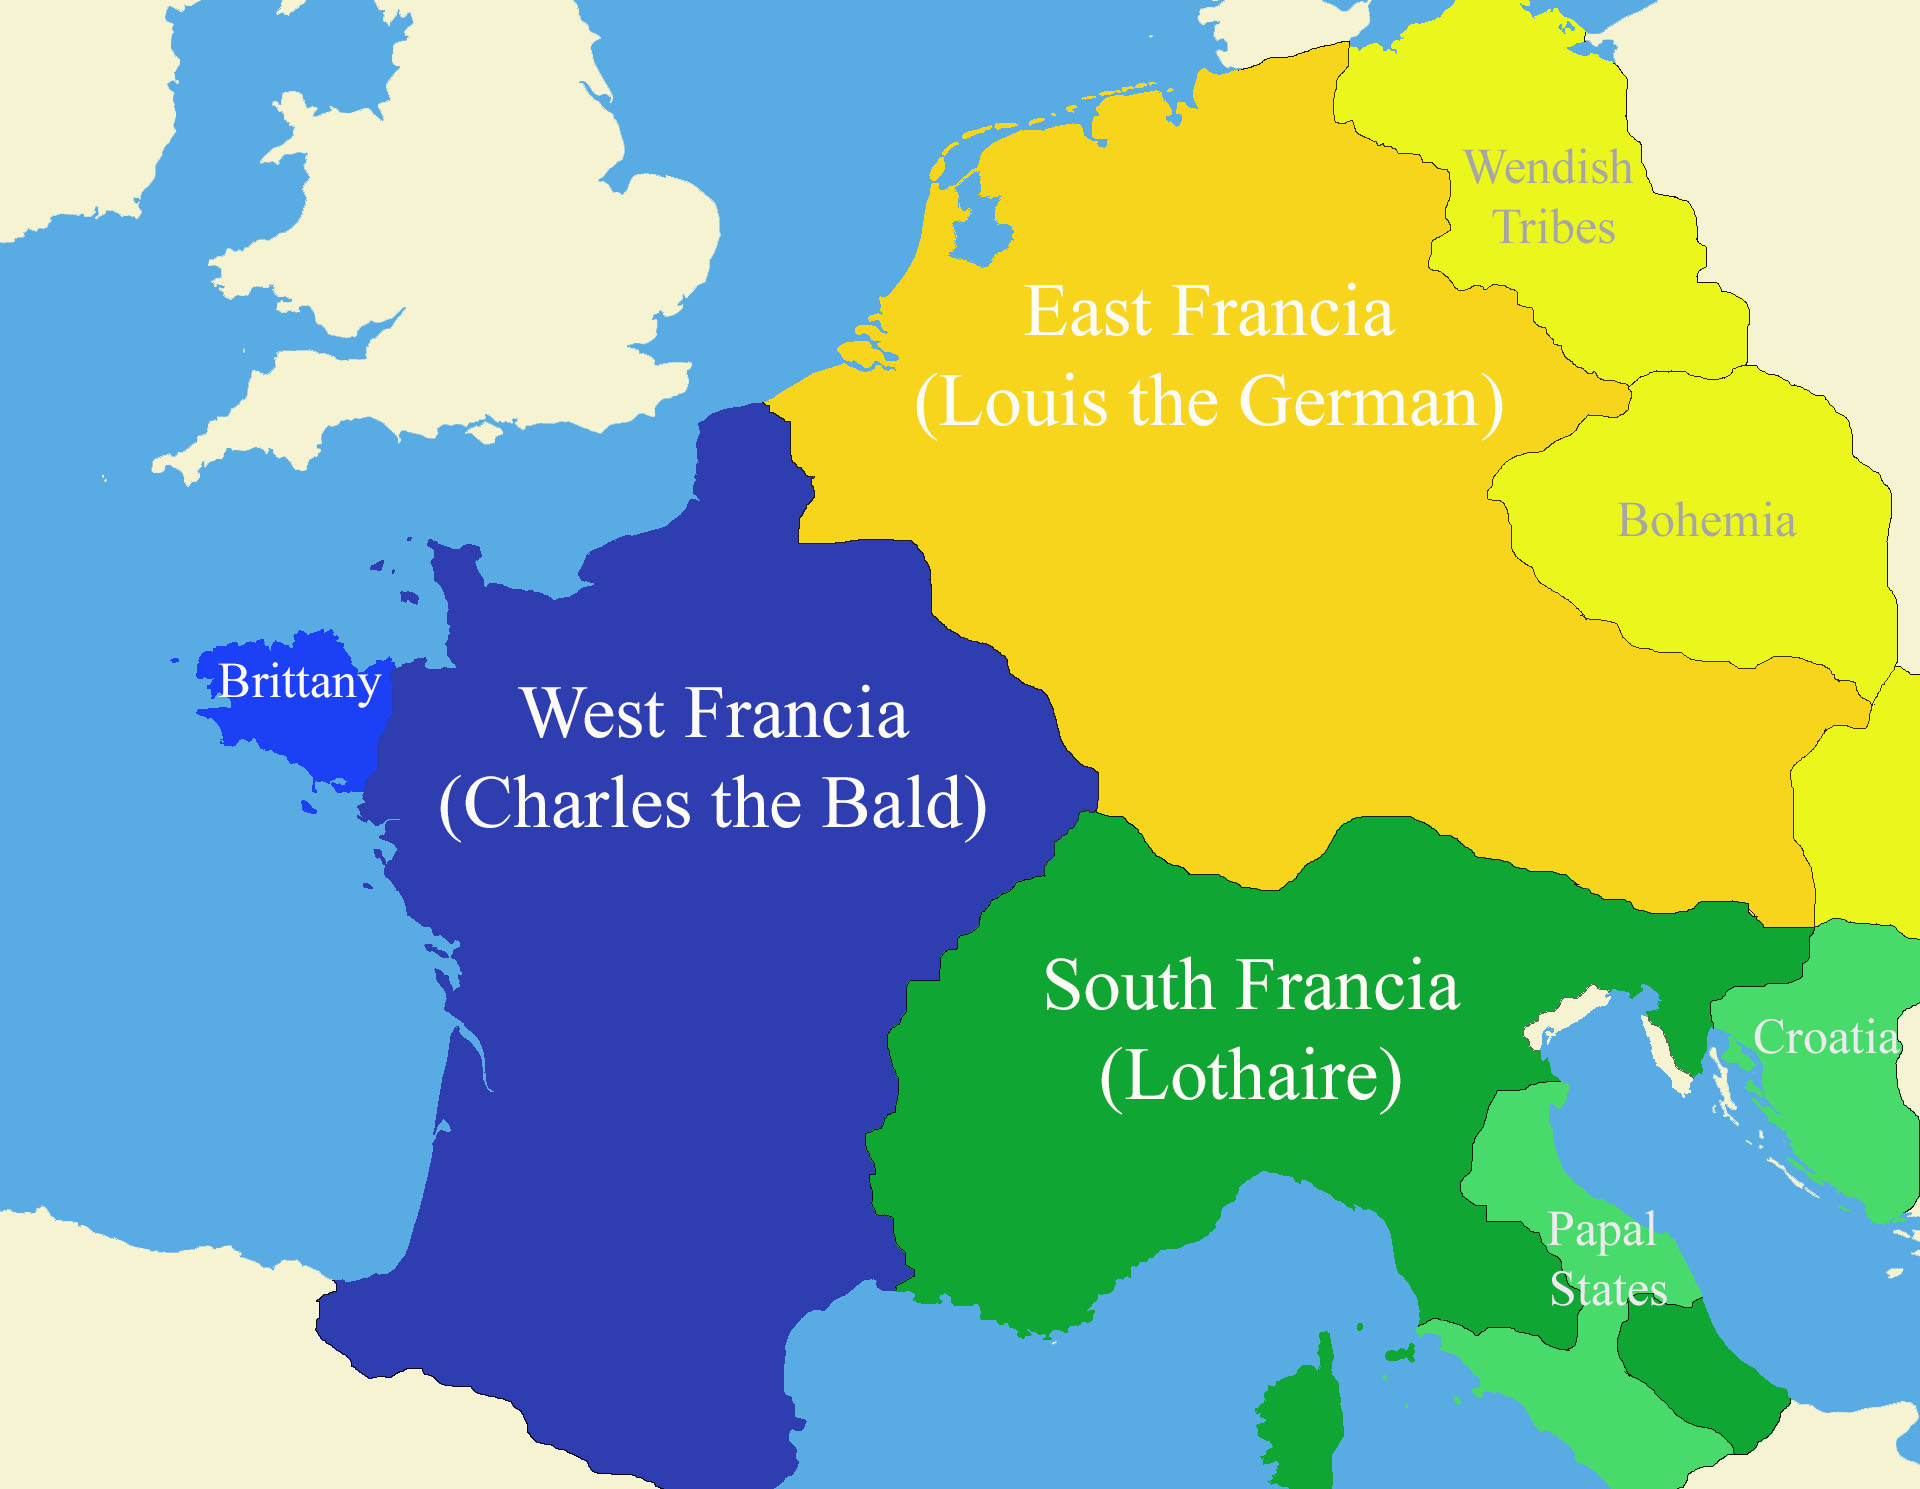 south frankia with vassals.jpg